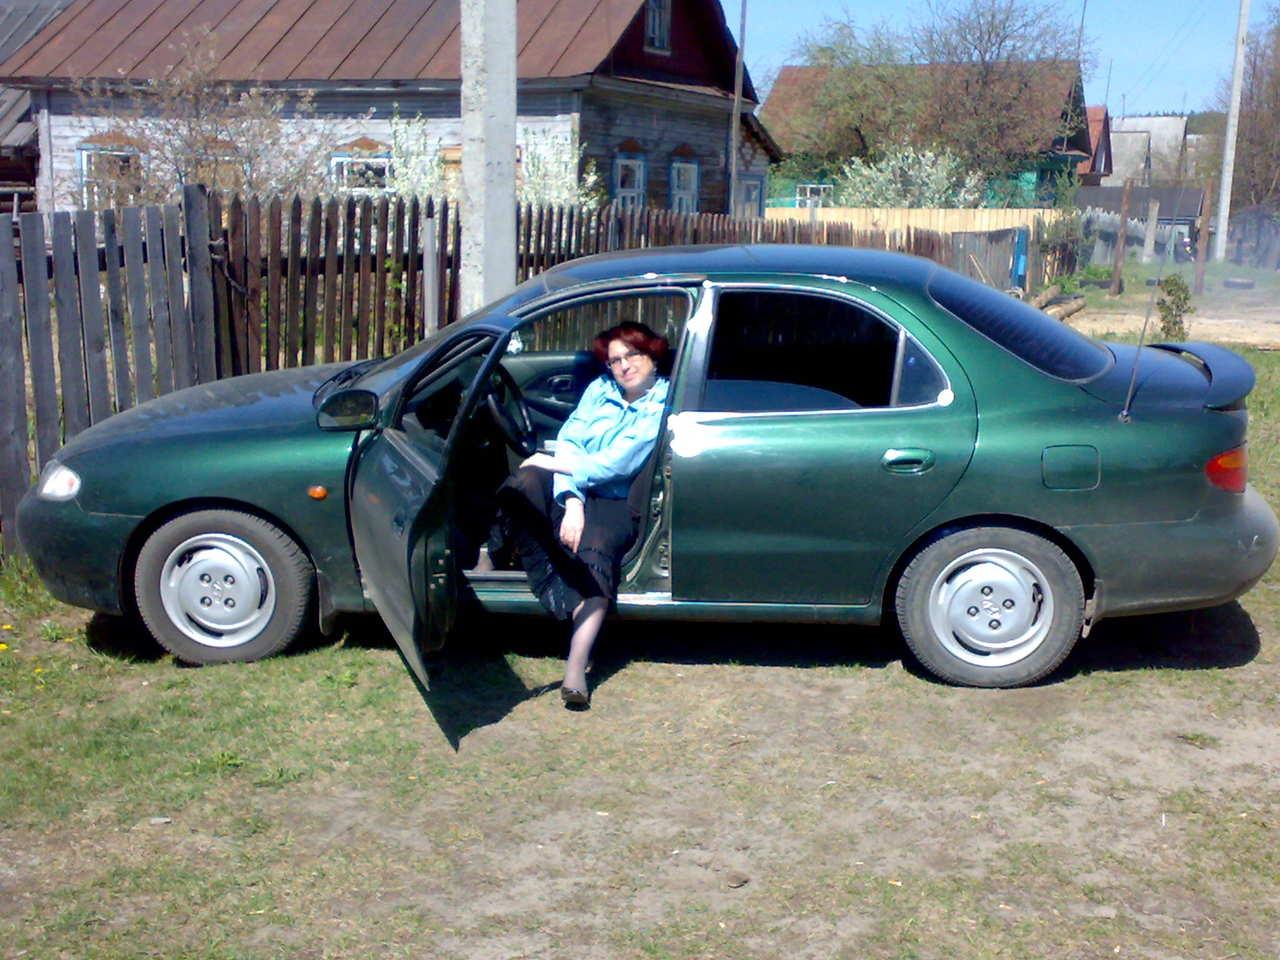 Hyundai Elantra: Troubleshooting